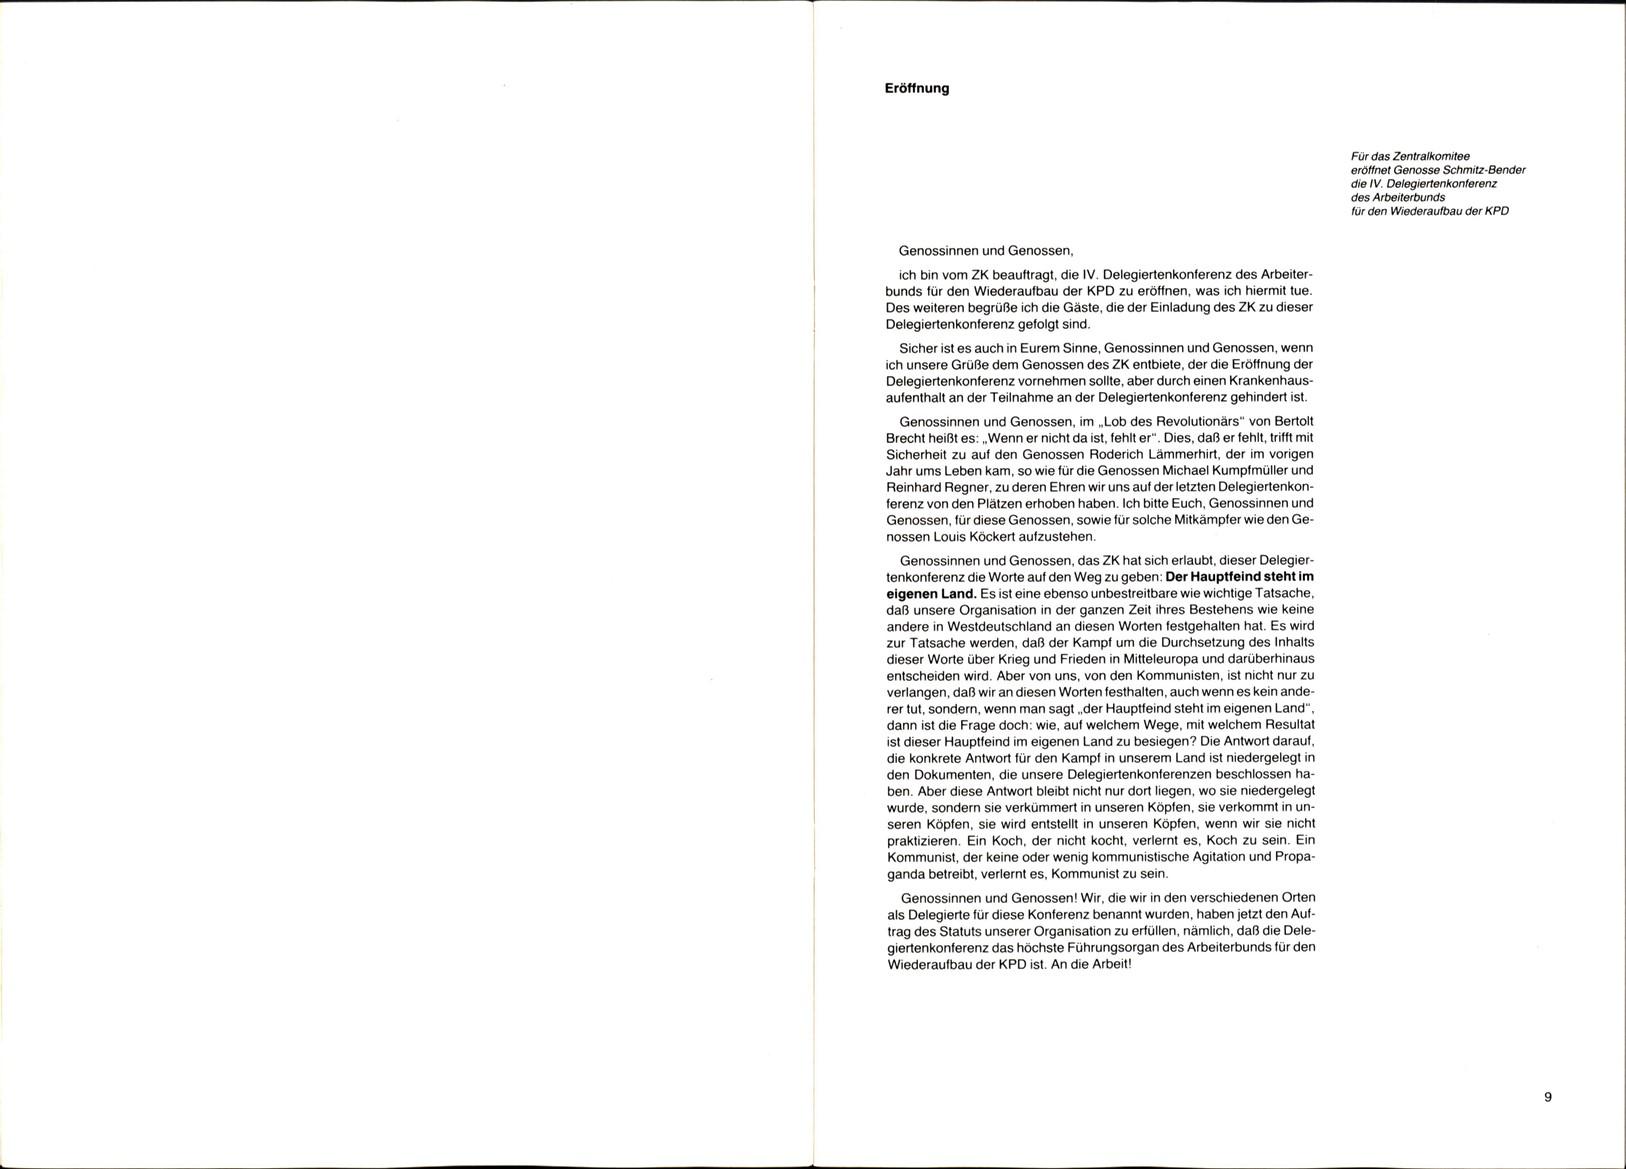 ABG_1985_Beschluesse_IV_Delegiertenkonferenz_06